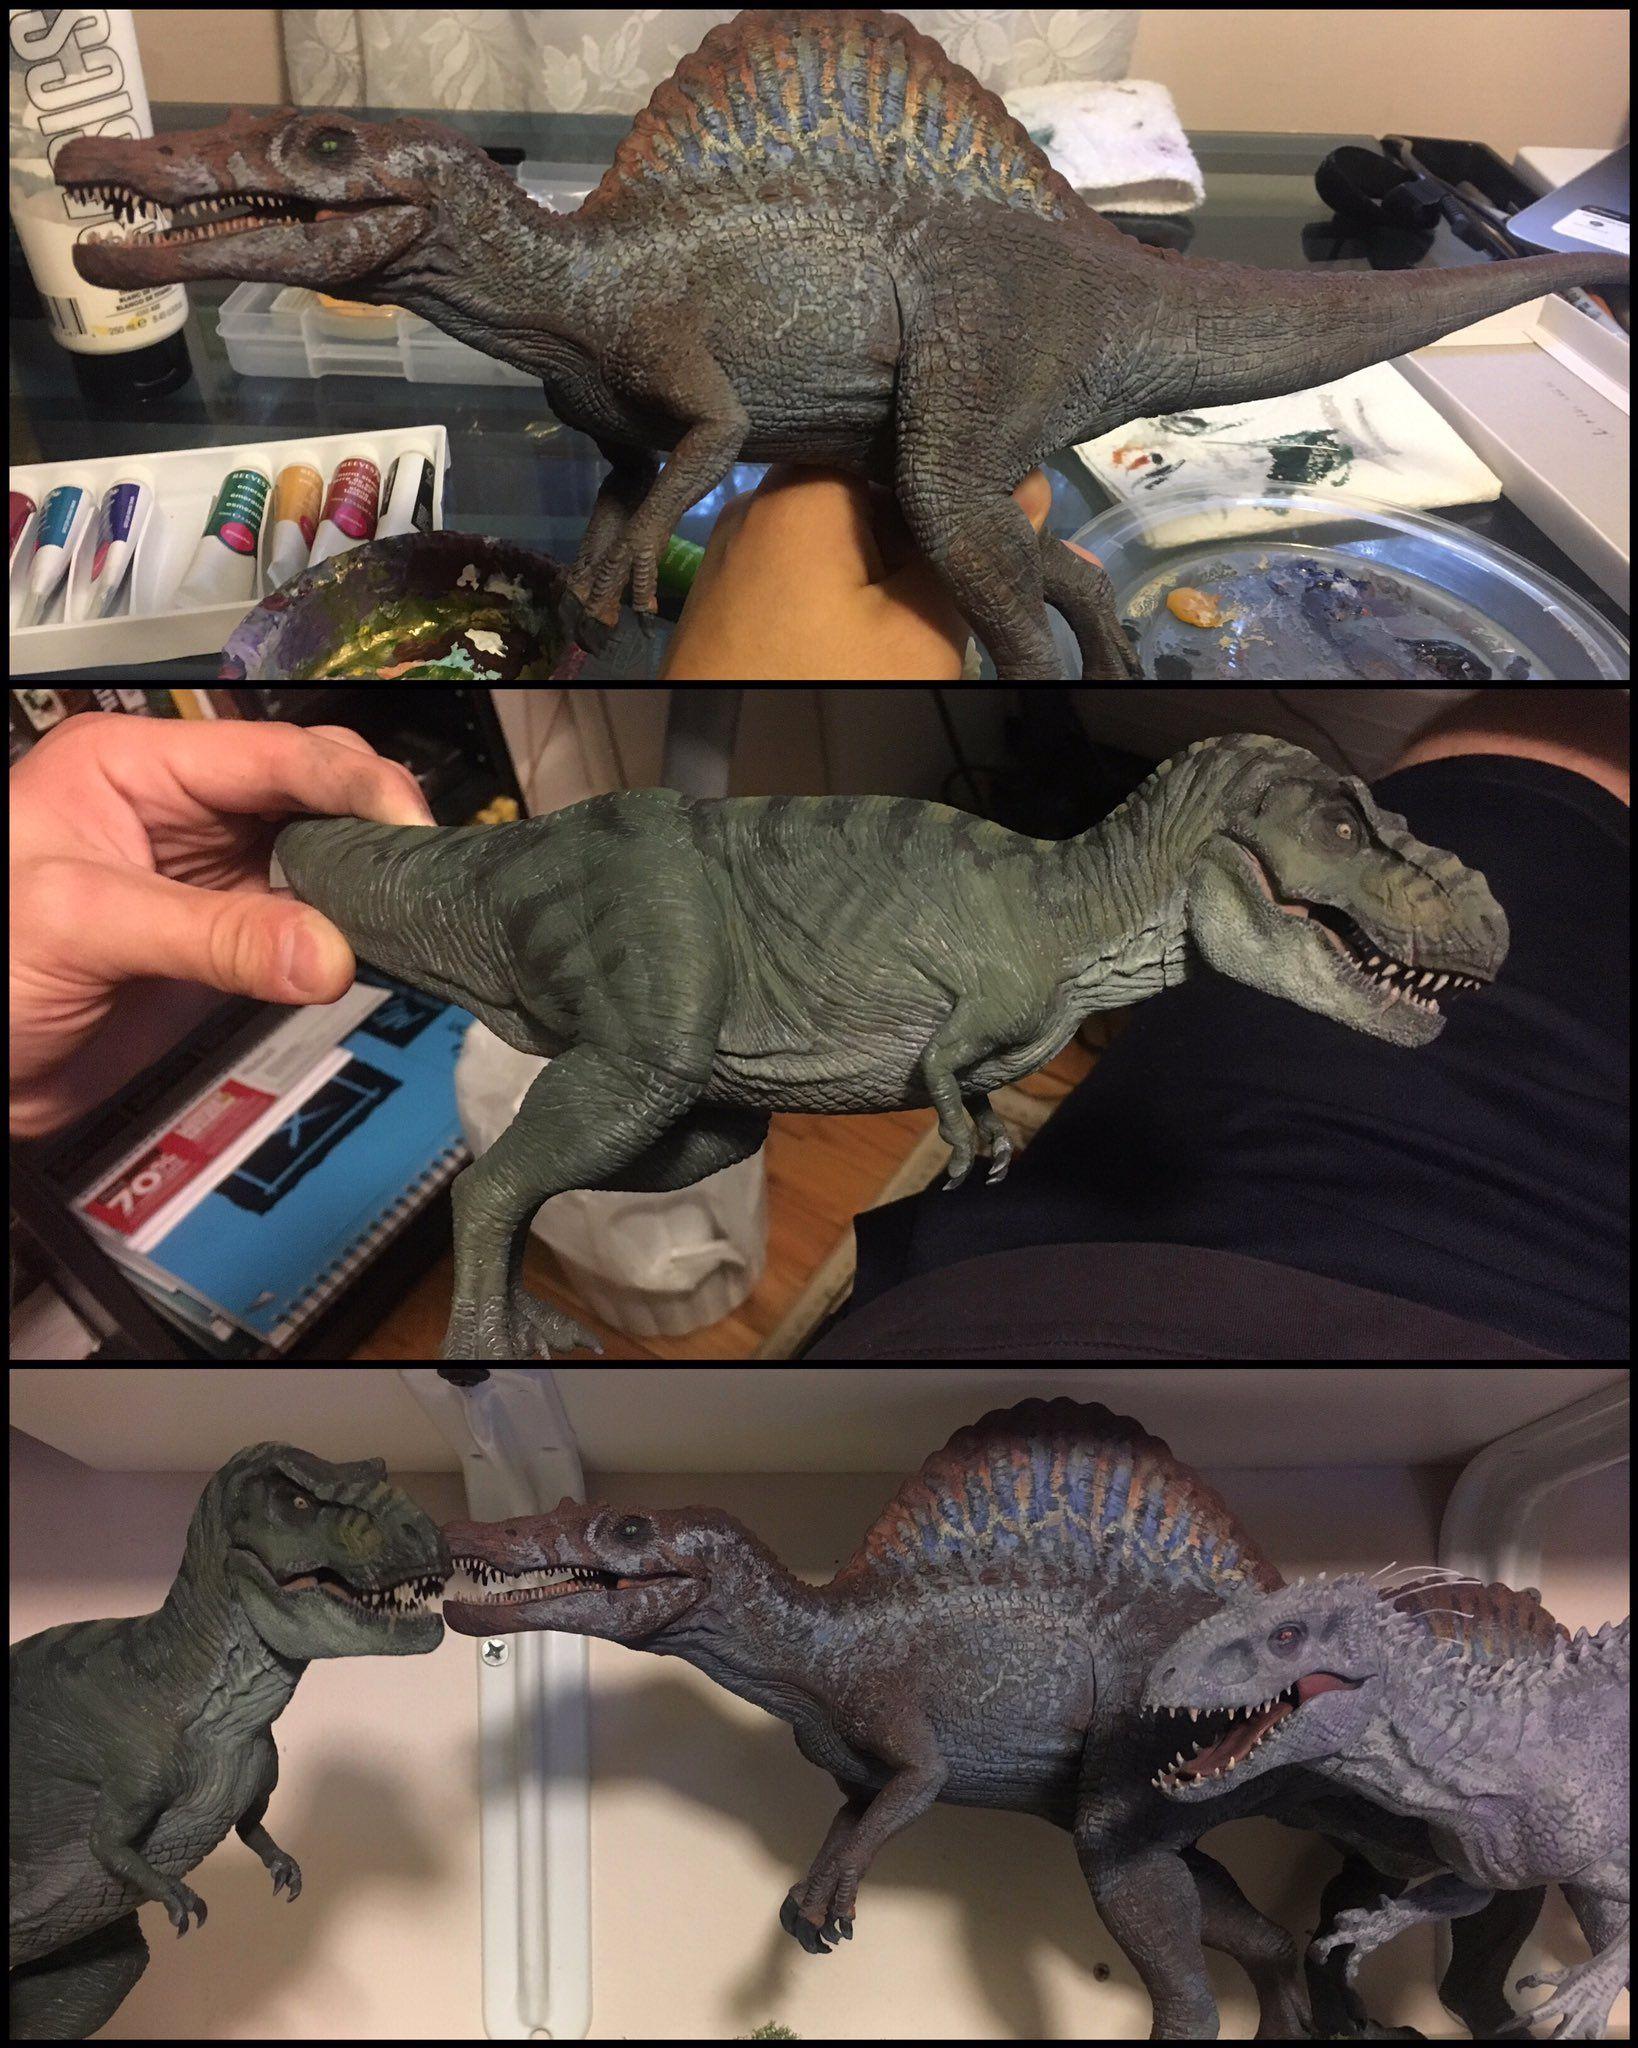 Jaroslav Kosmina On Twitter Jurassic Park World Jurassic Park Jurassic World Dinosaurs